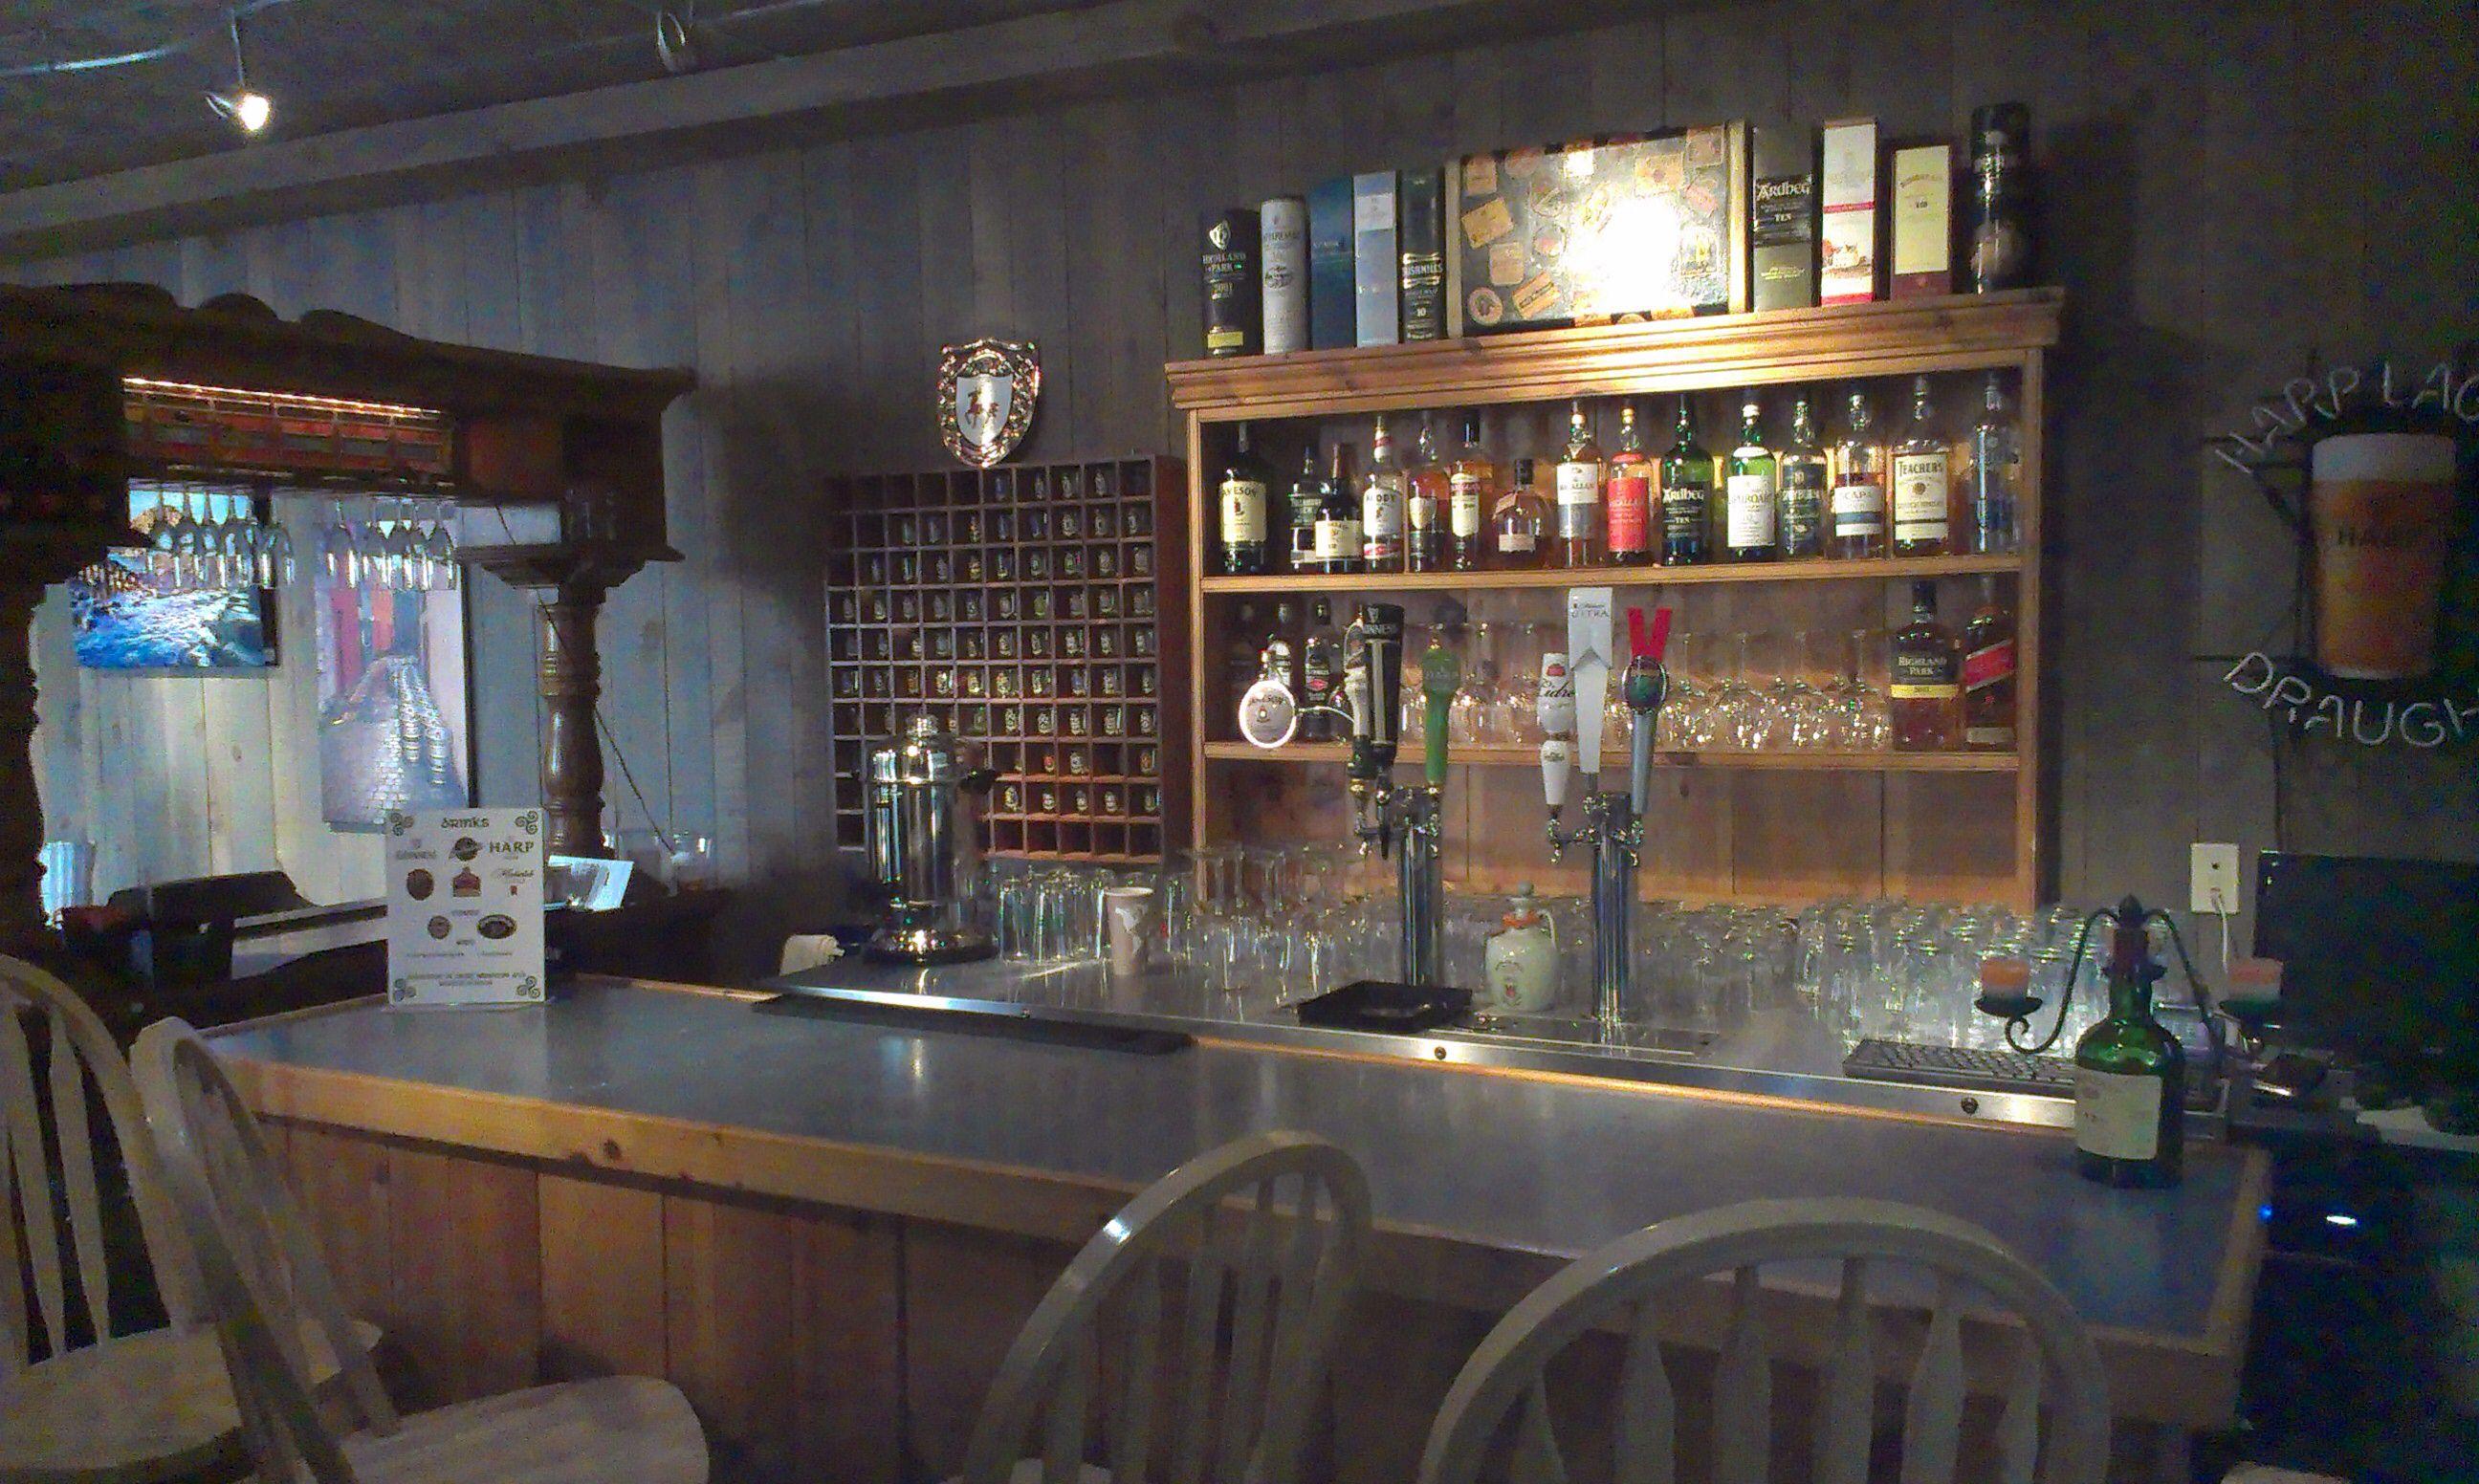 Granny mccarthys tearoom in bethlehem recently acquired